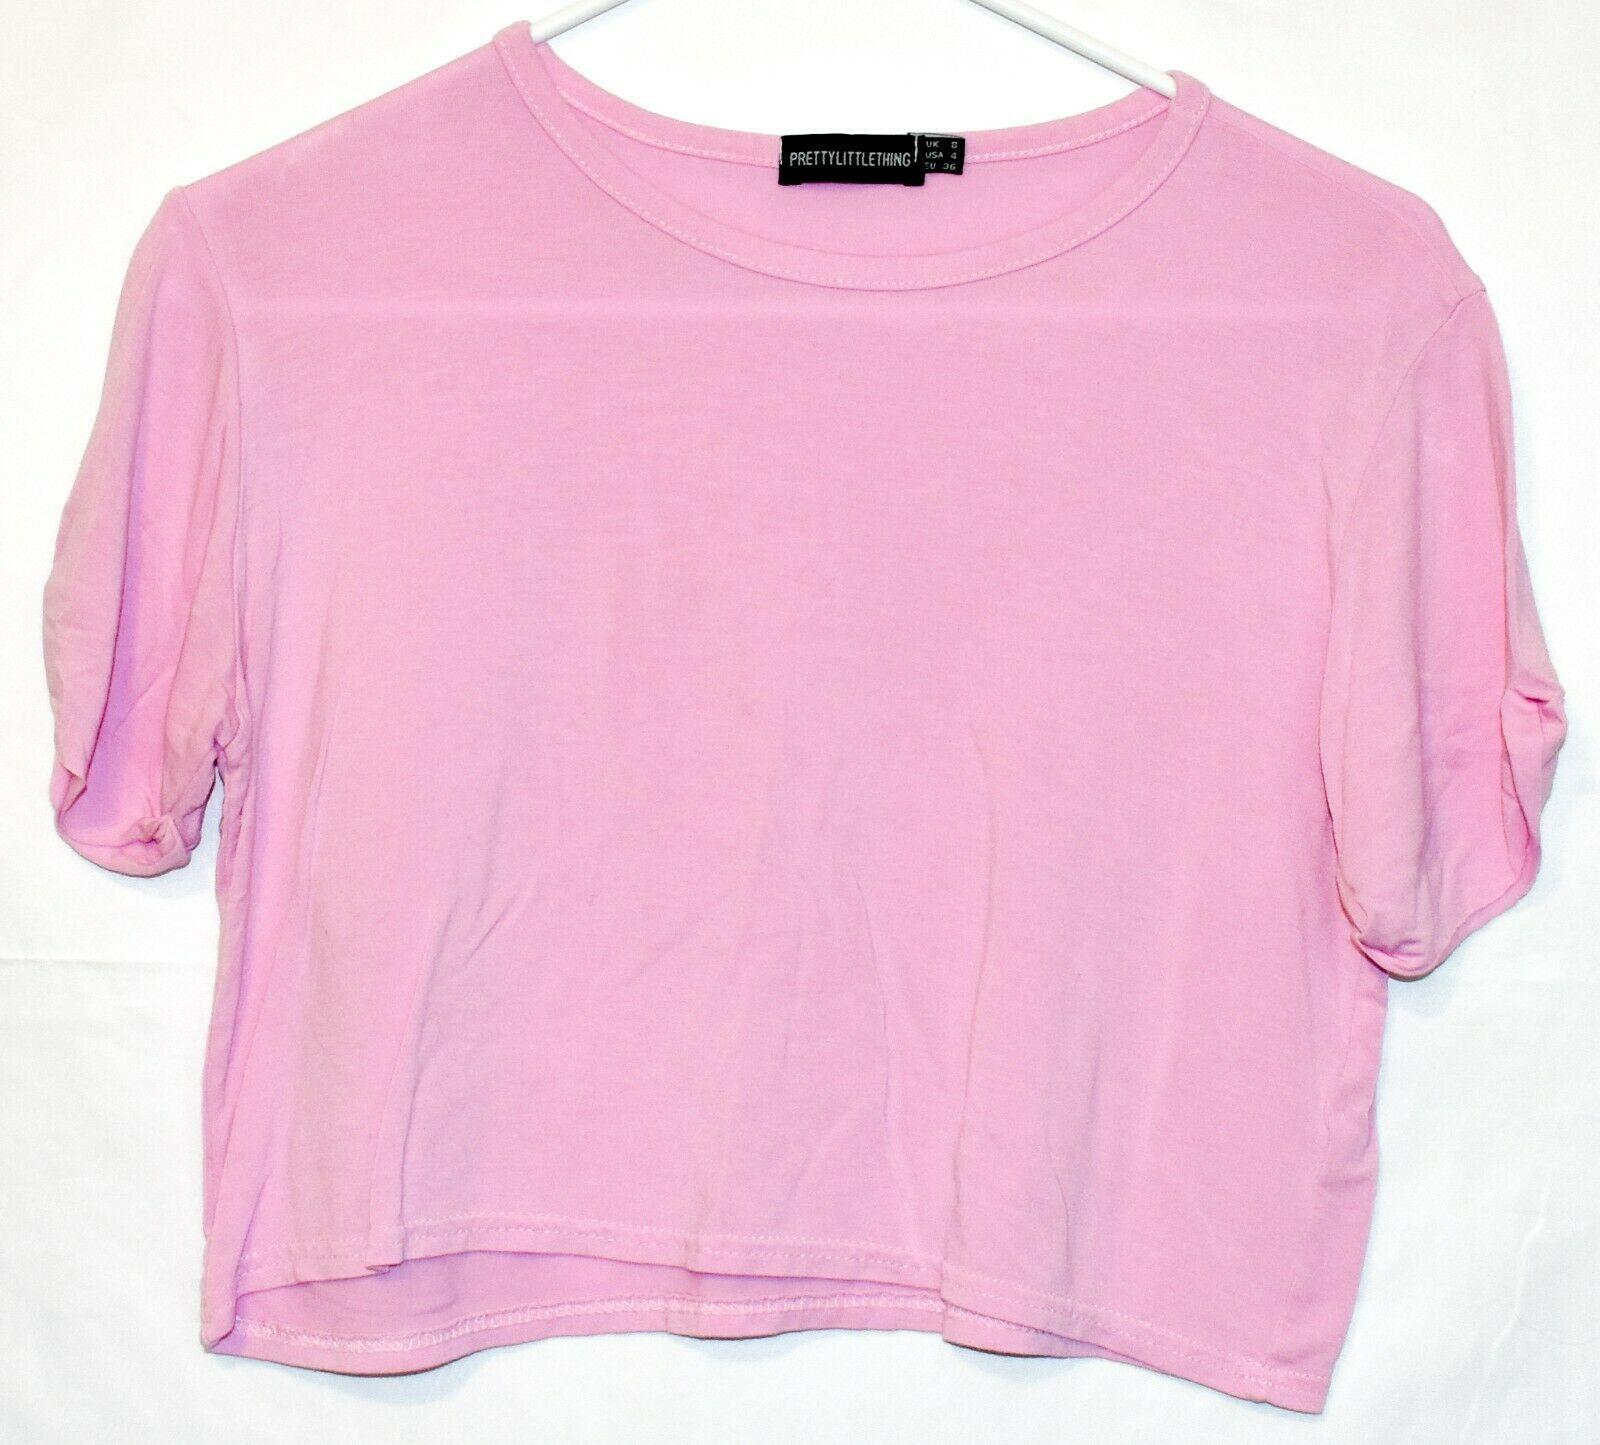 Pretty Little Thing Women's Lavender Pink Purple Crop Top T-Shirt Size 4